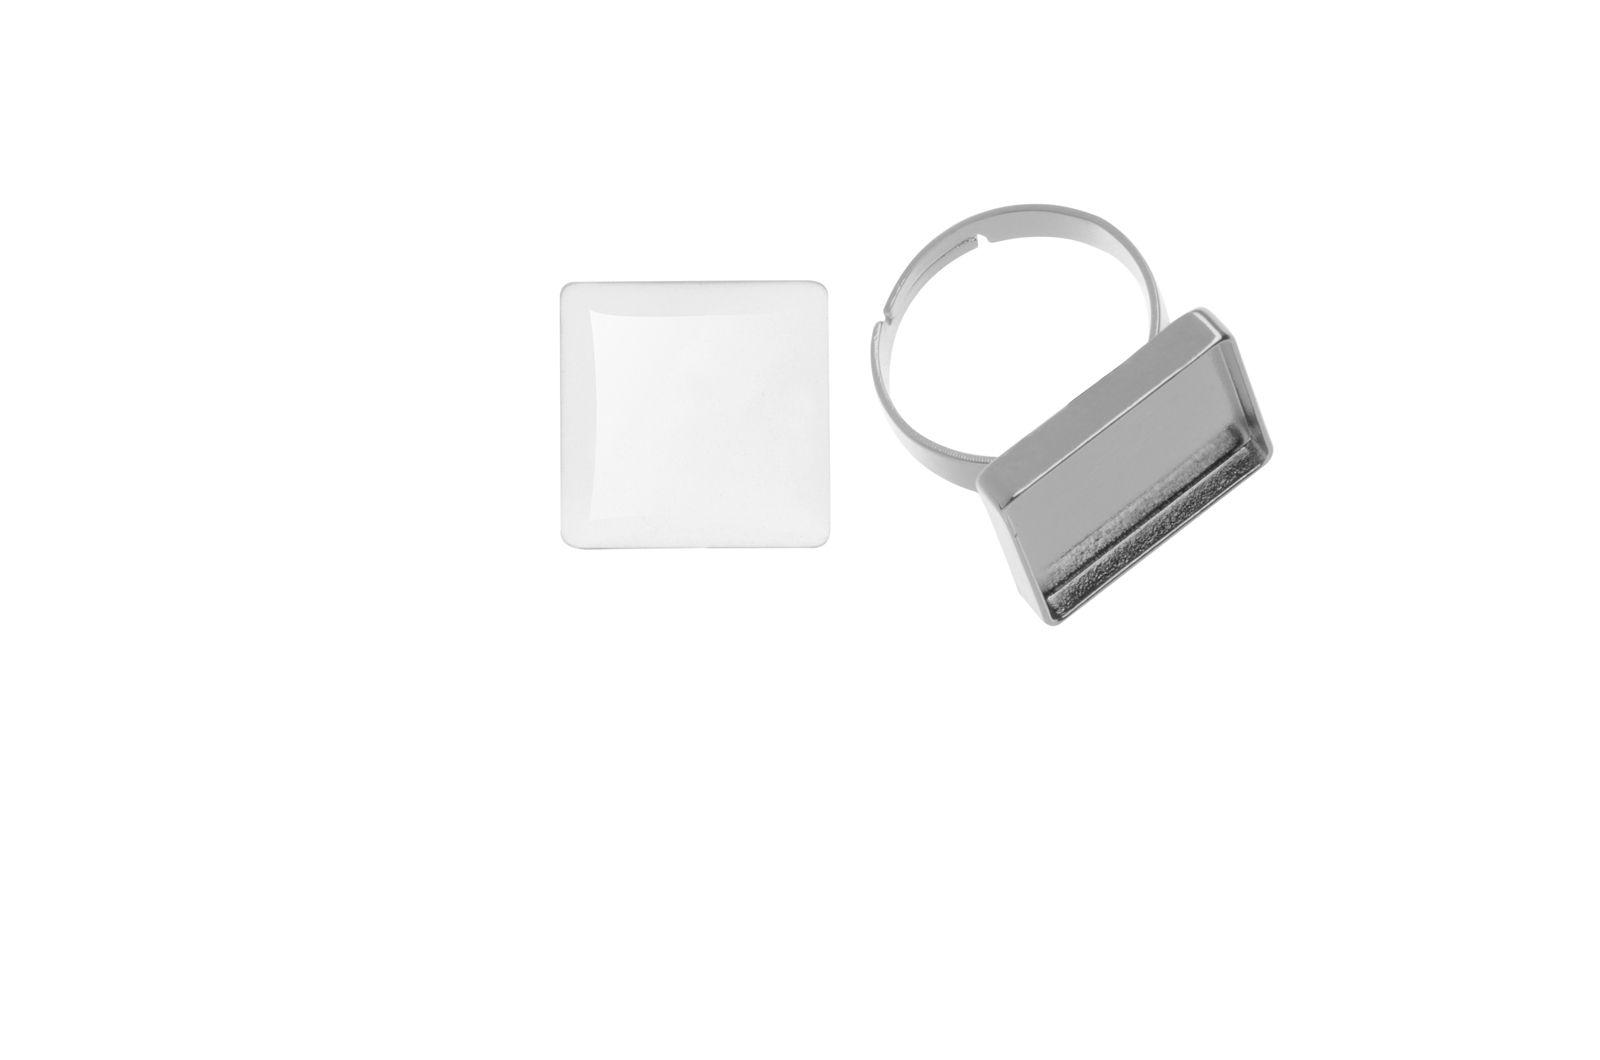 61633001 Кольцо квадратное Cabochon, серебристый цвет, 20x20мм Glorex